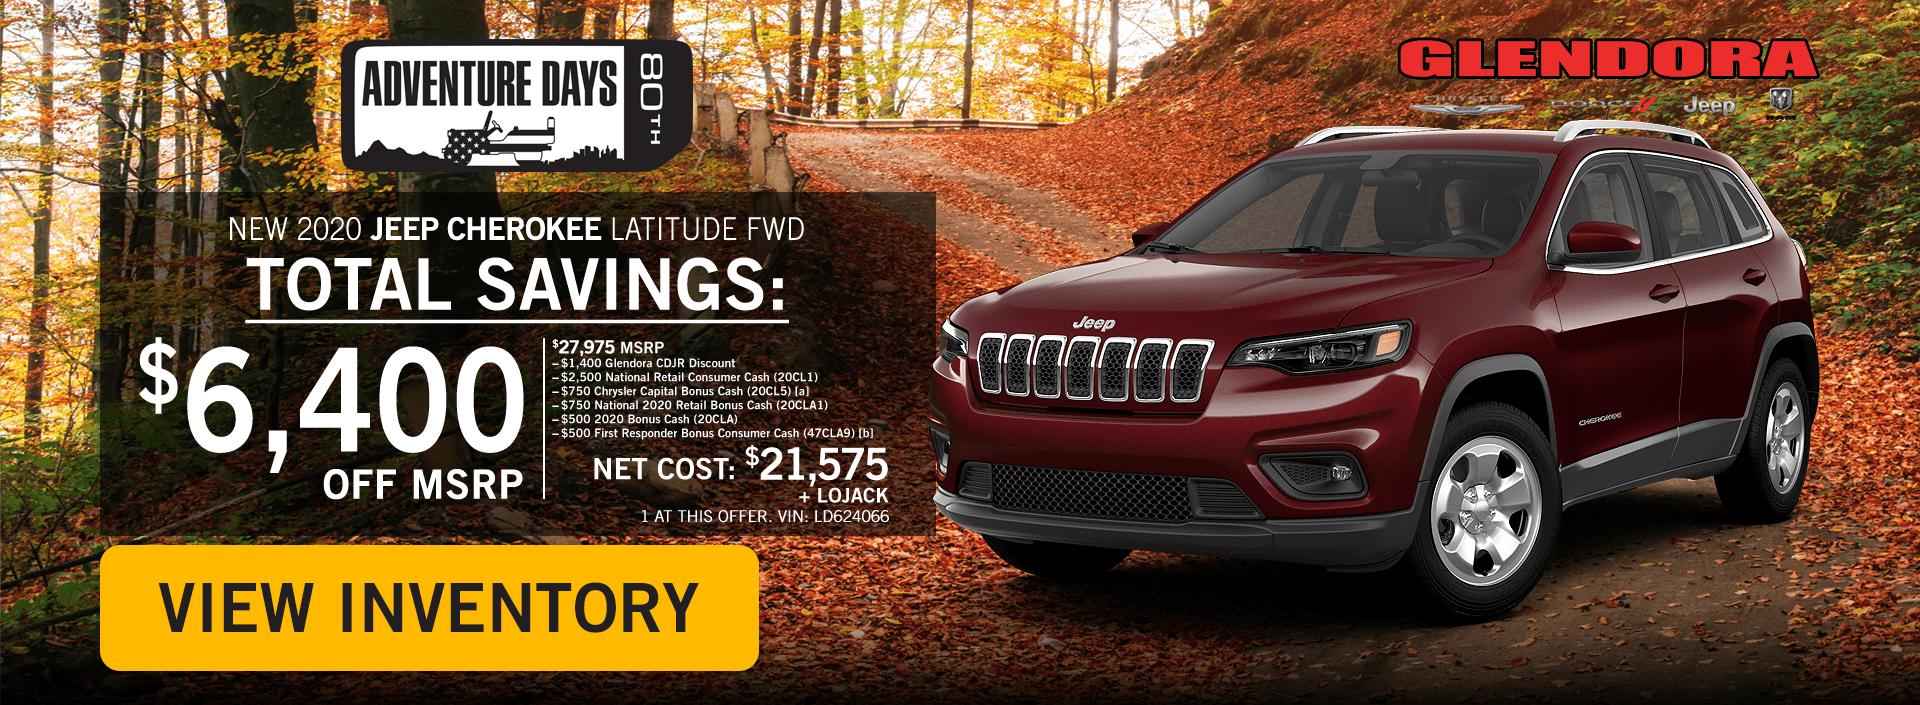 Glendora_CDJR_2020_October_Deals_Jeep_Adventure_Jeep_Cherokee_Latitude_Home1